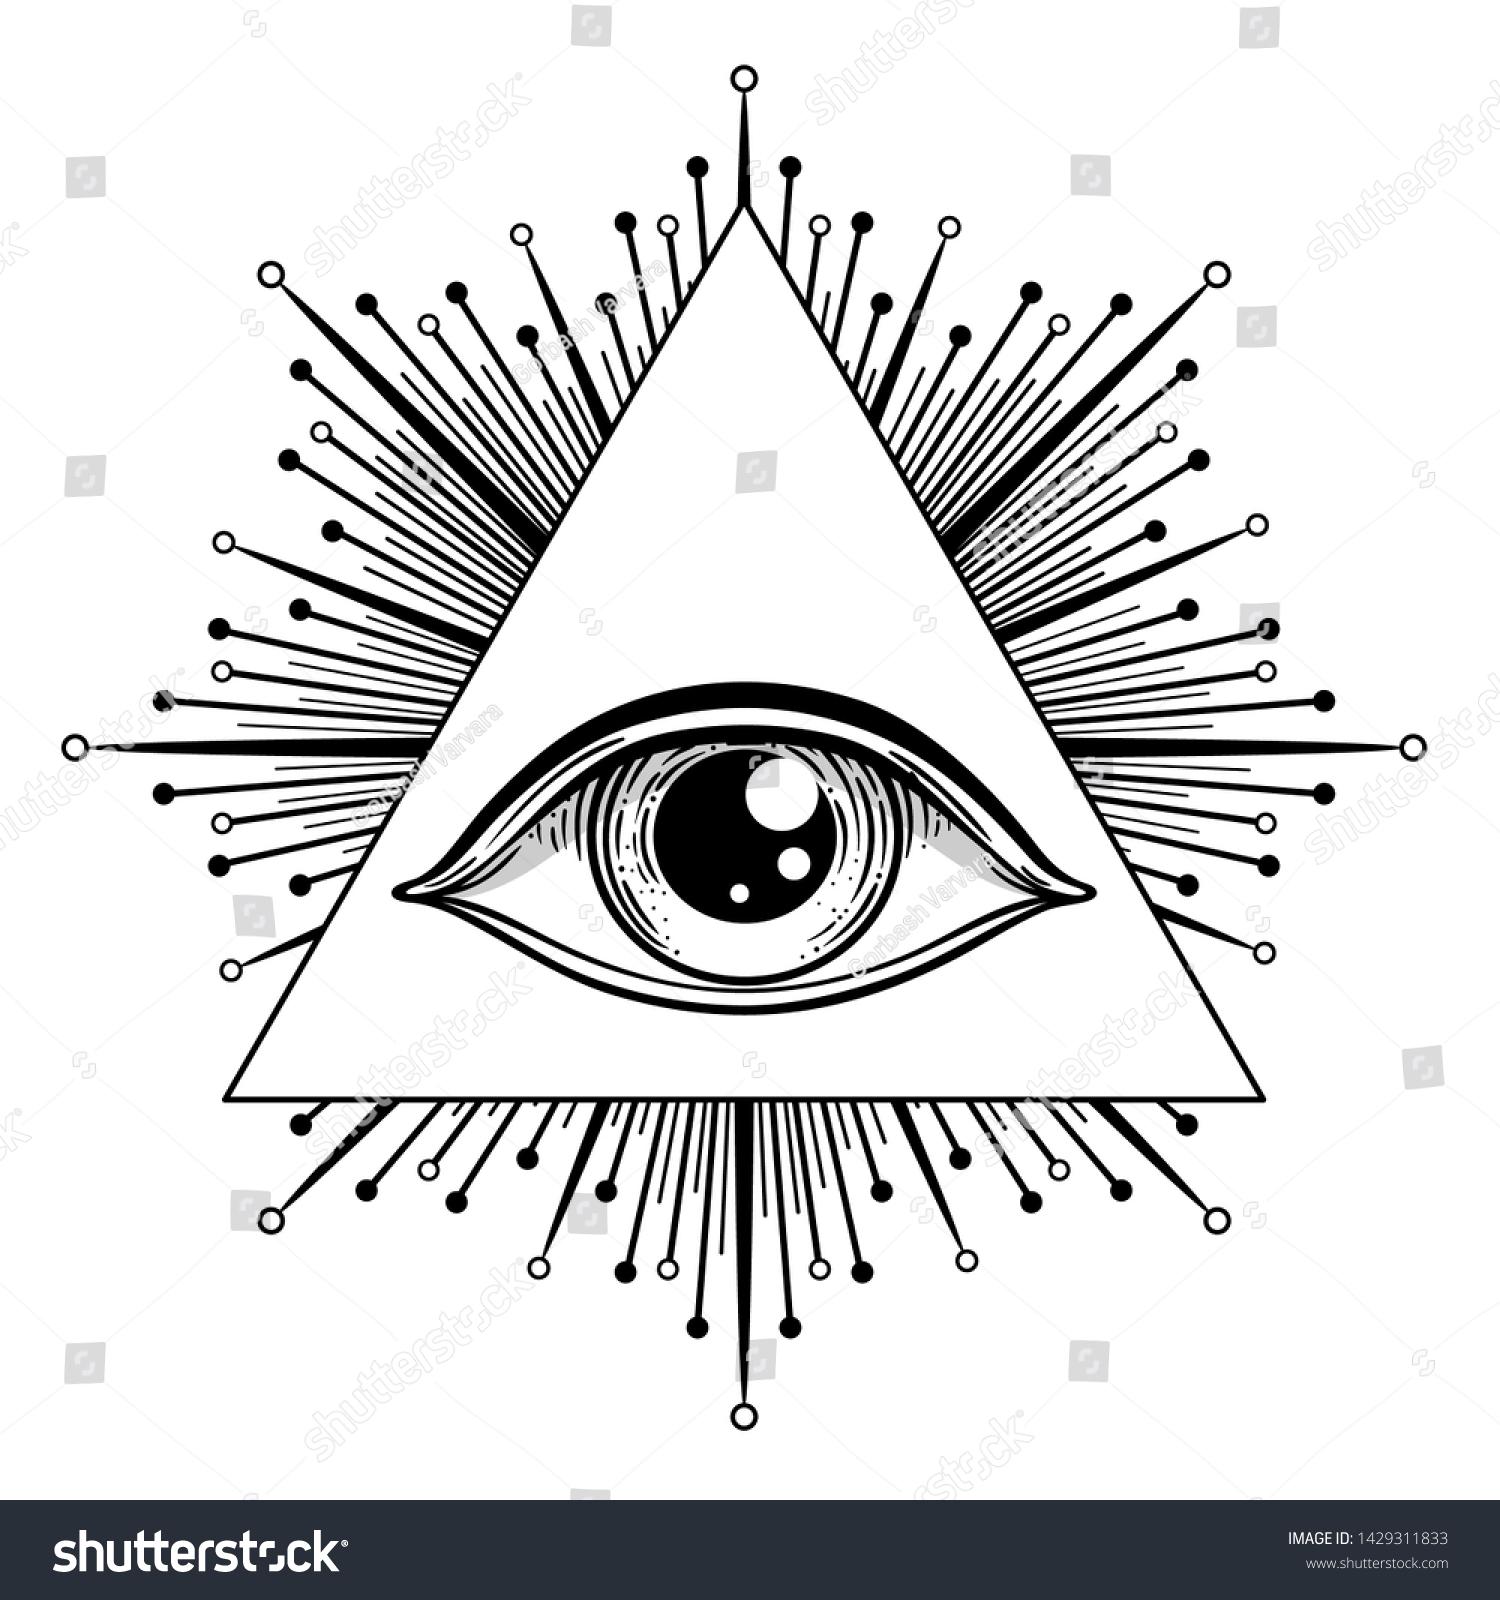 Vetor Stock De Blackwork Tattoo Flash Eye Providence Masonic Livre De Direitos 1429311833